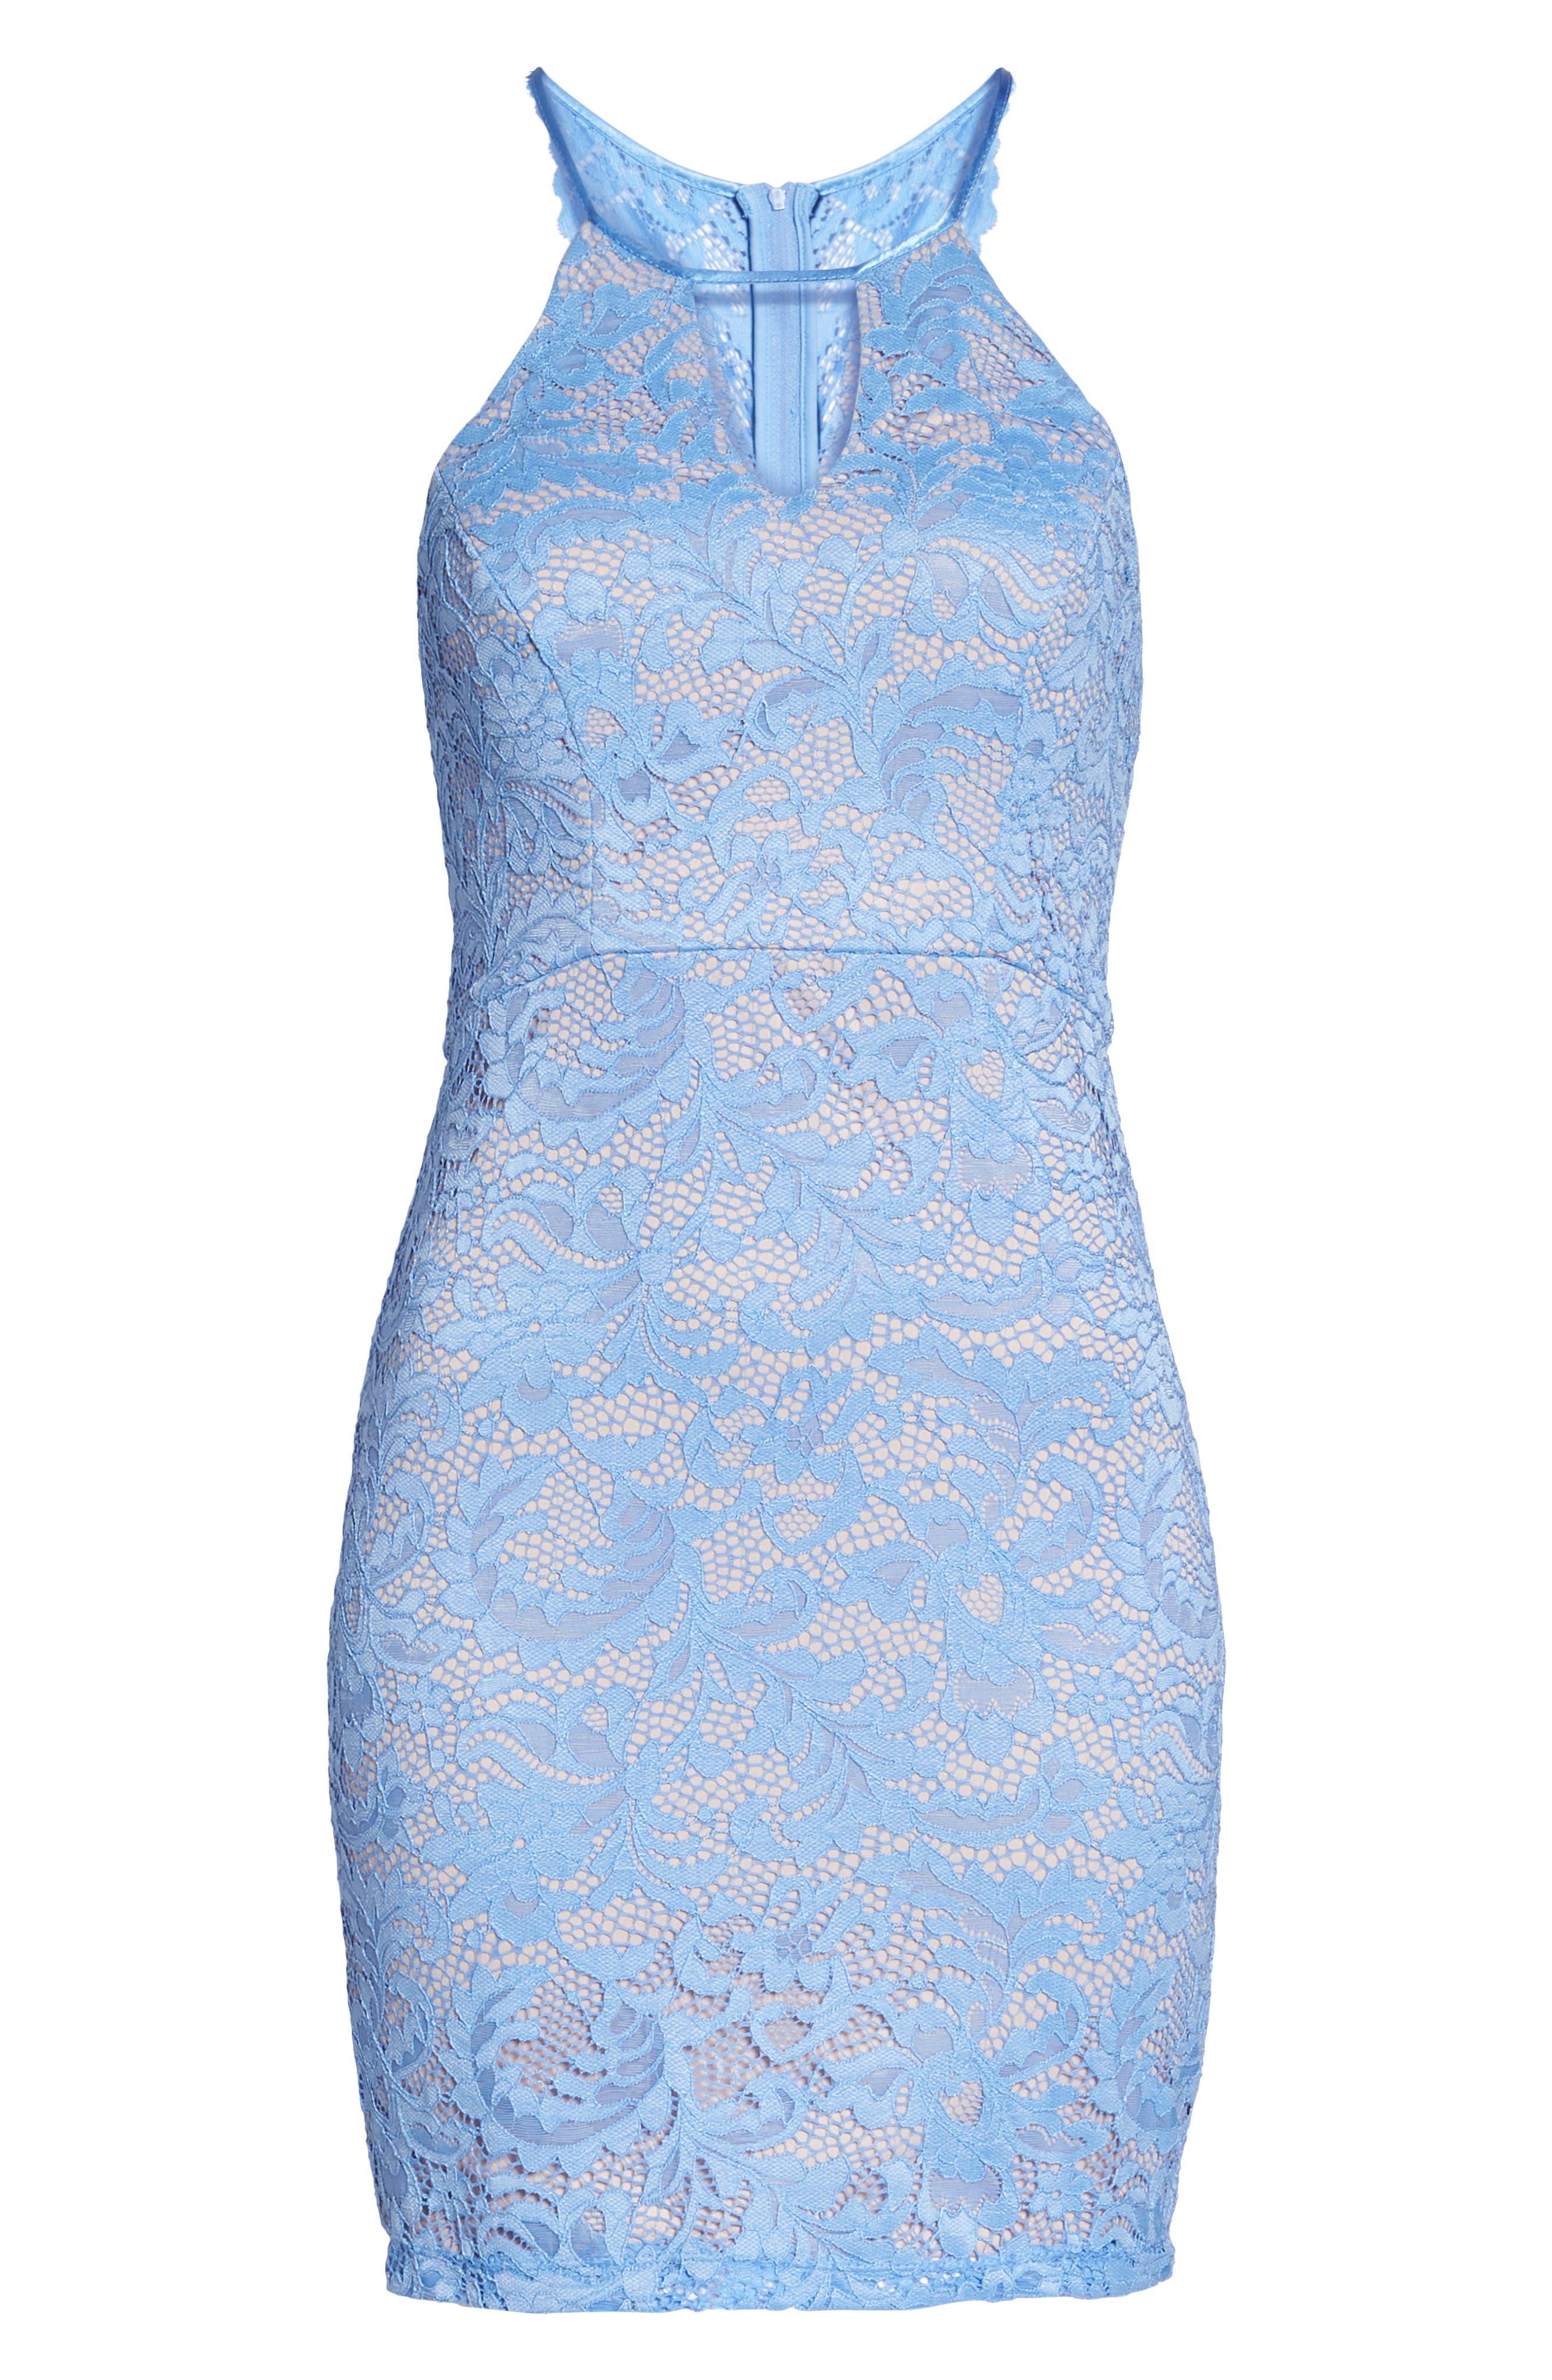 Racerback Lace Halter Dress,                             Alternate thumbnail 6, color,